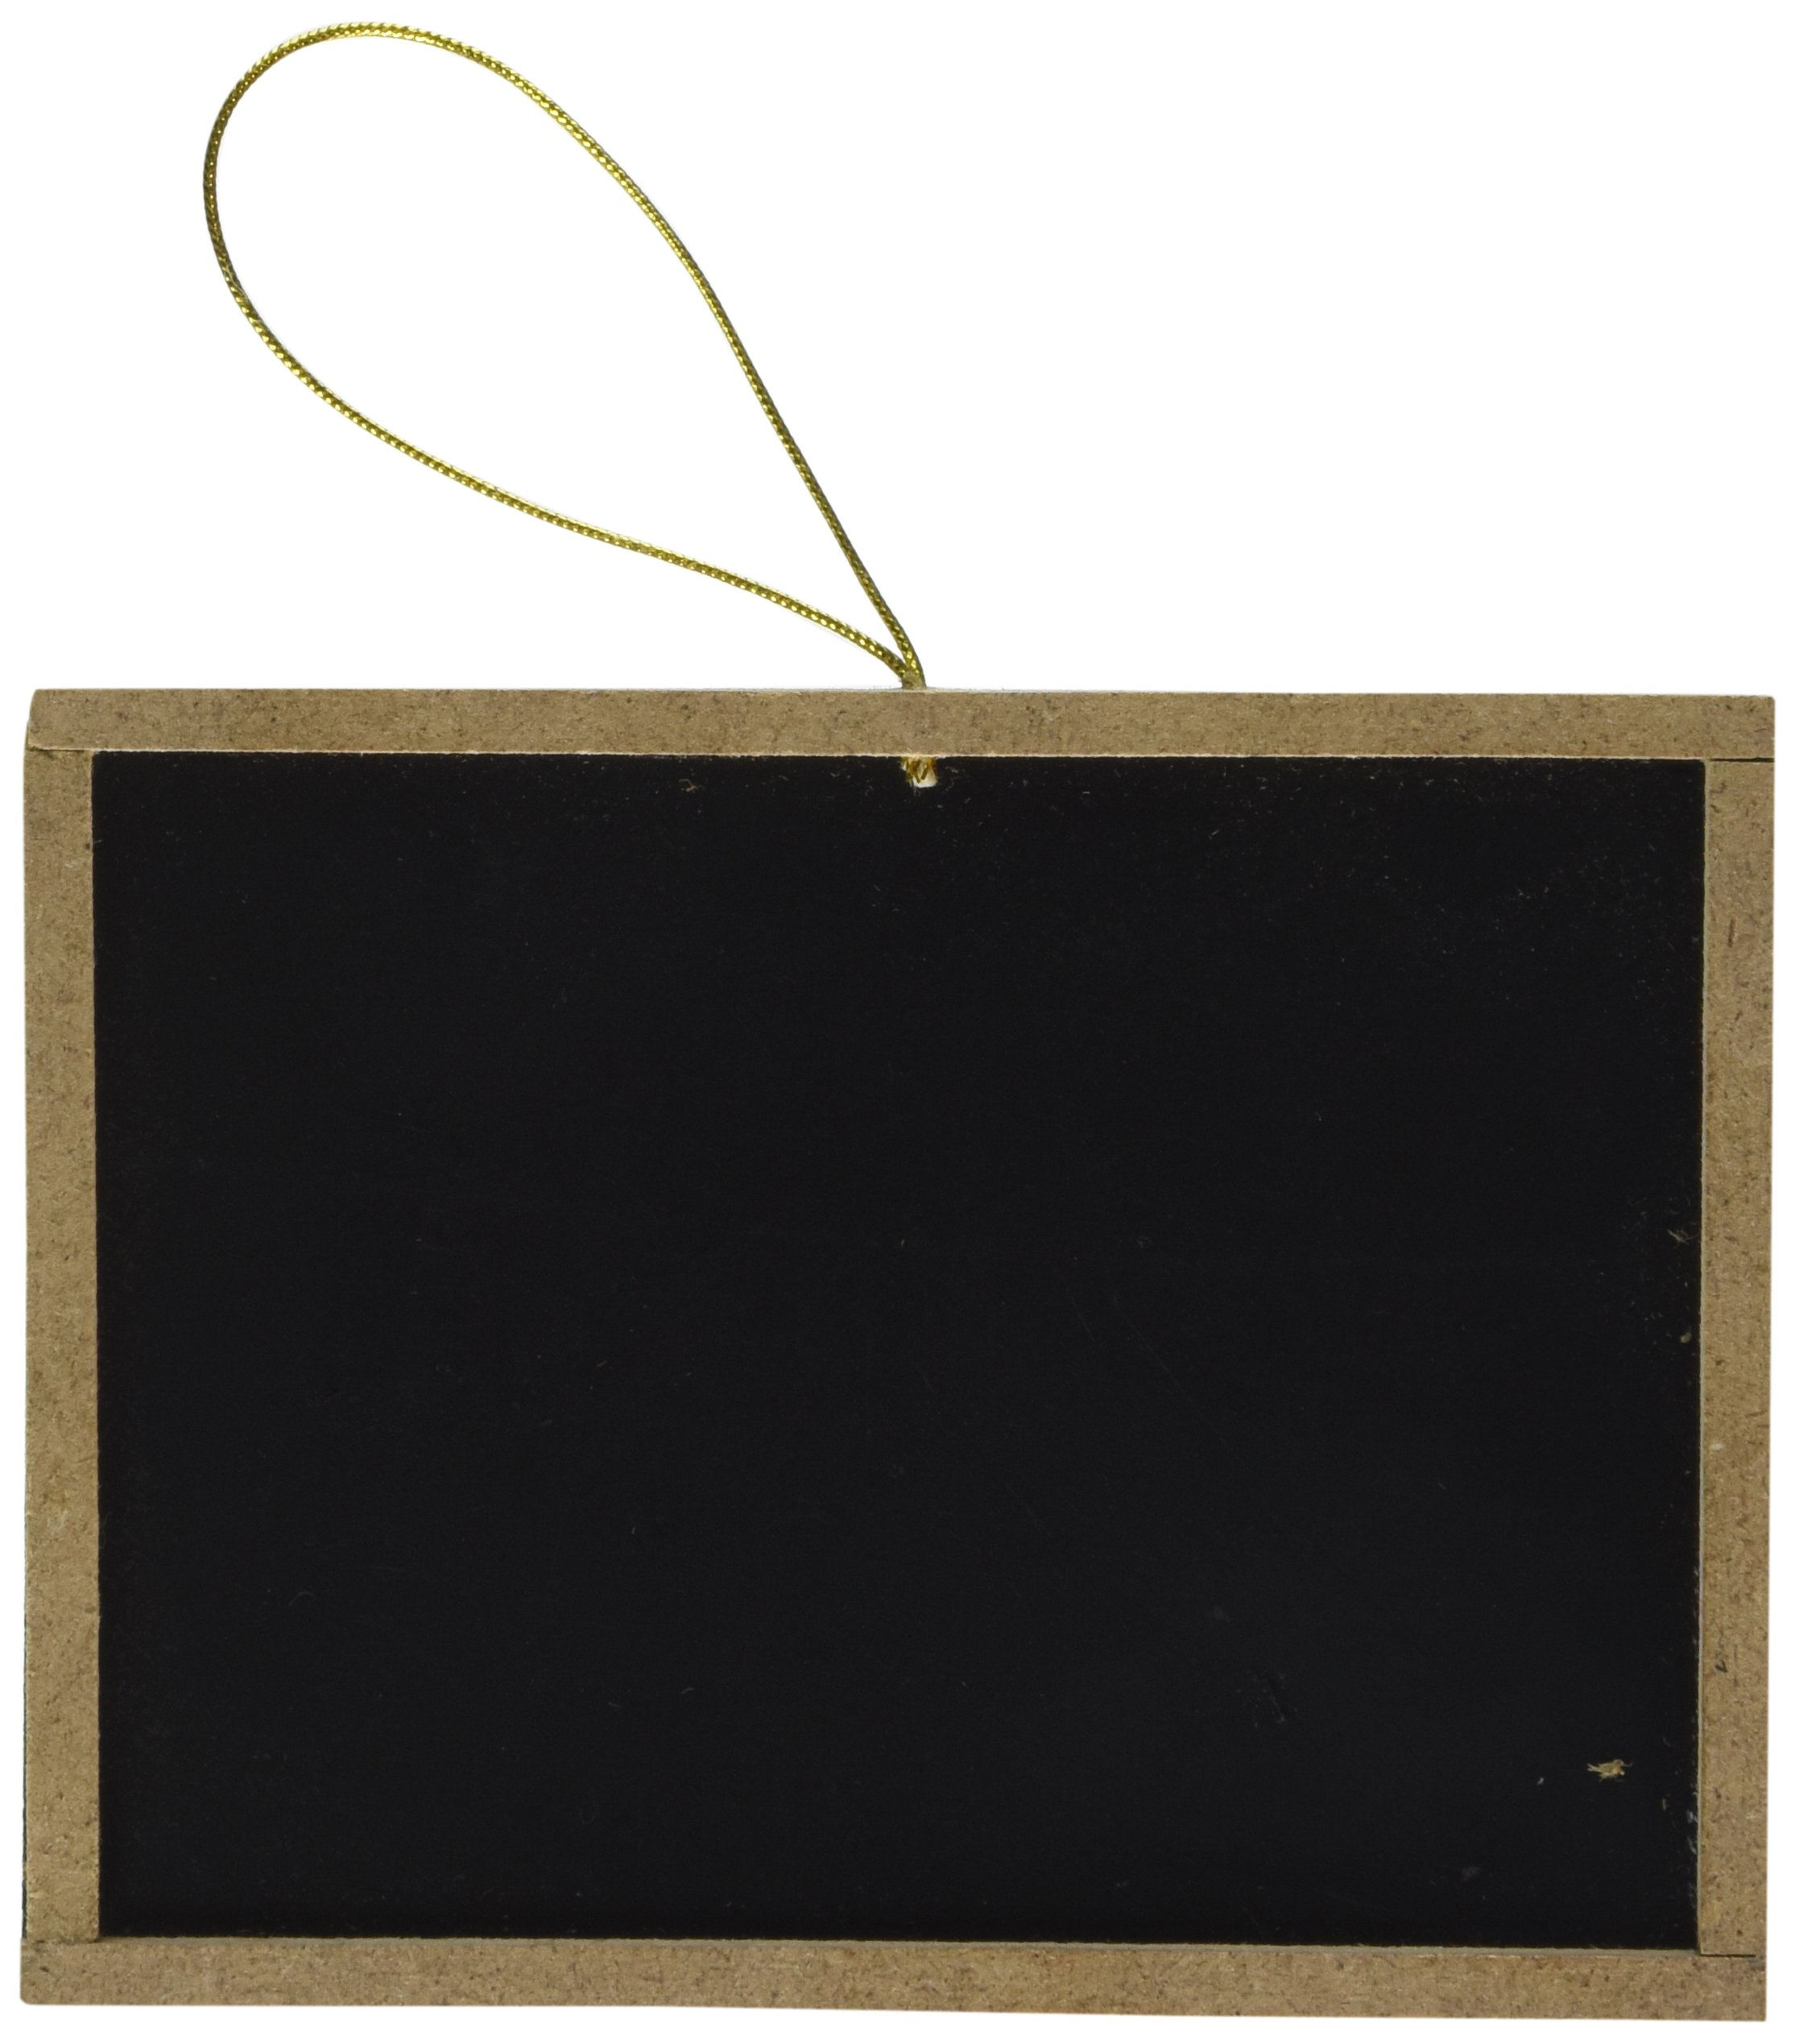 "24pc Mini Blackboard Message Board Wedding Chalkboard Favors Table Number 2/""x3/"""